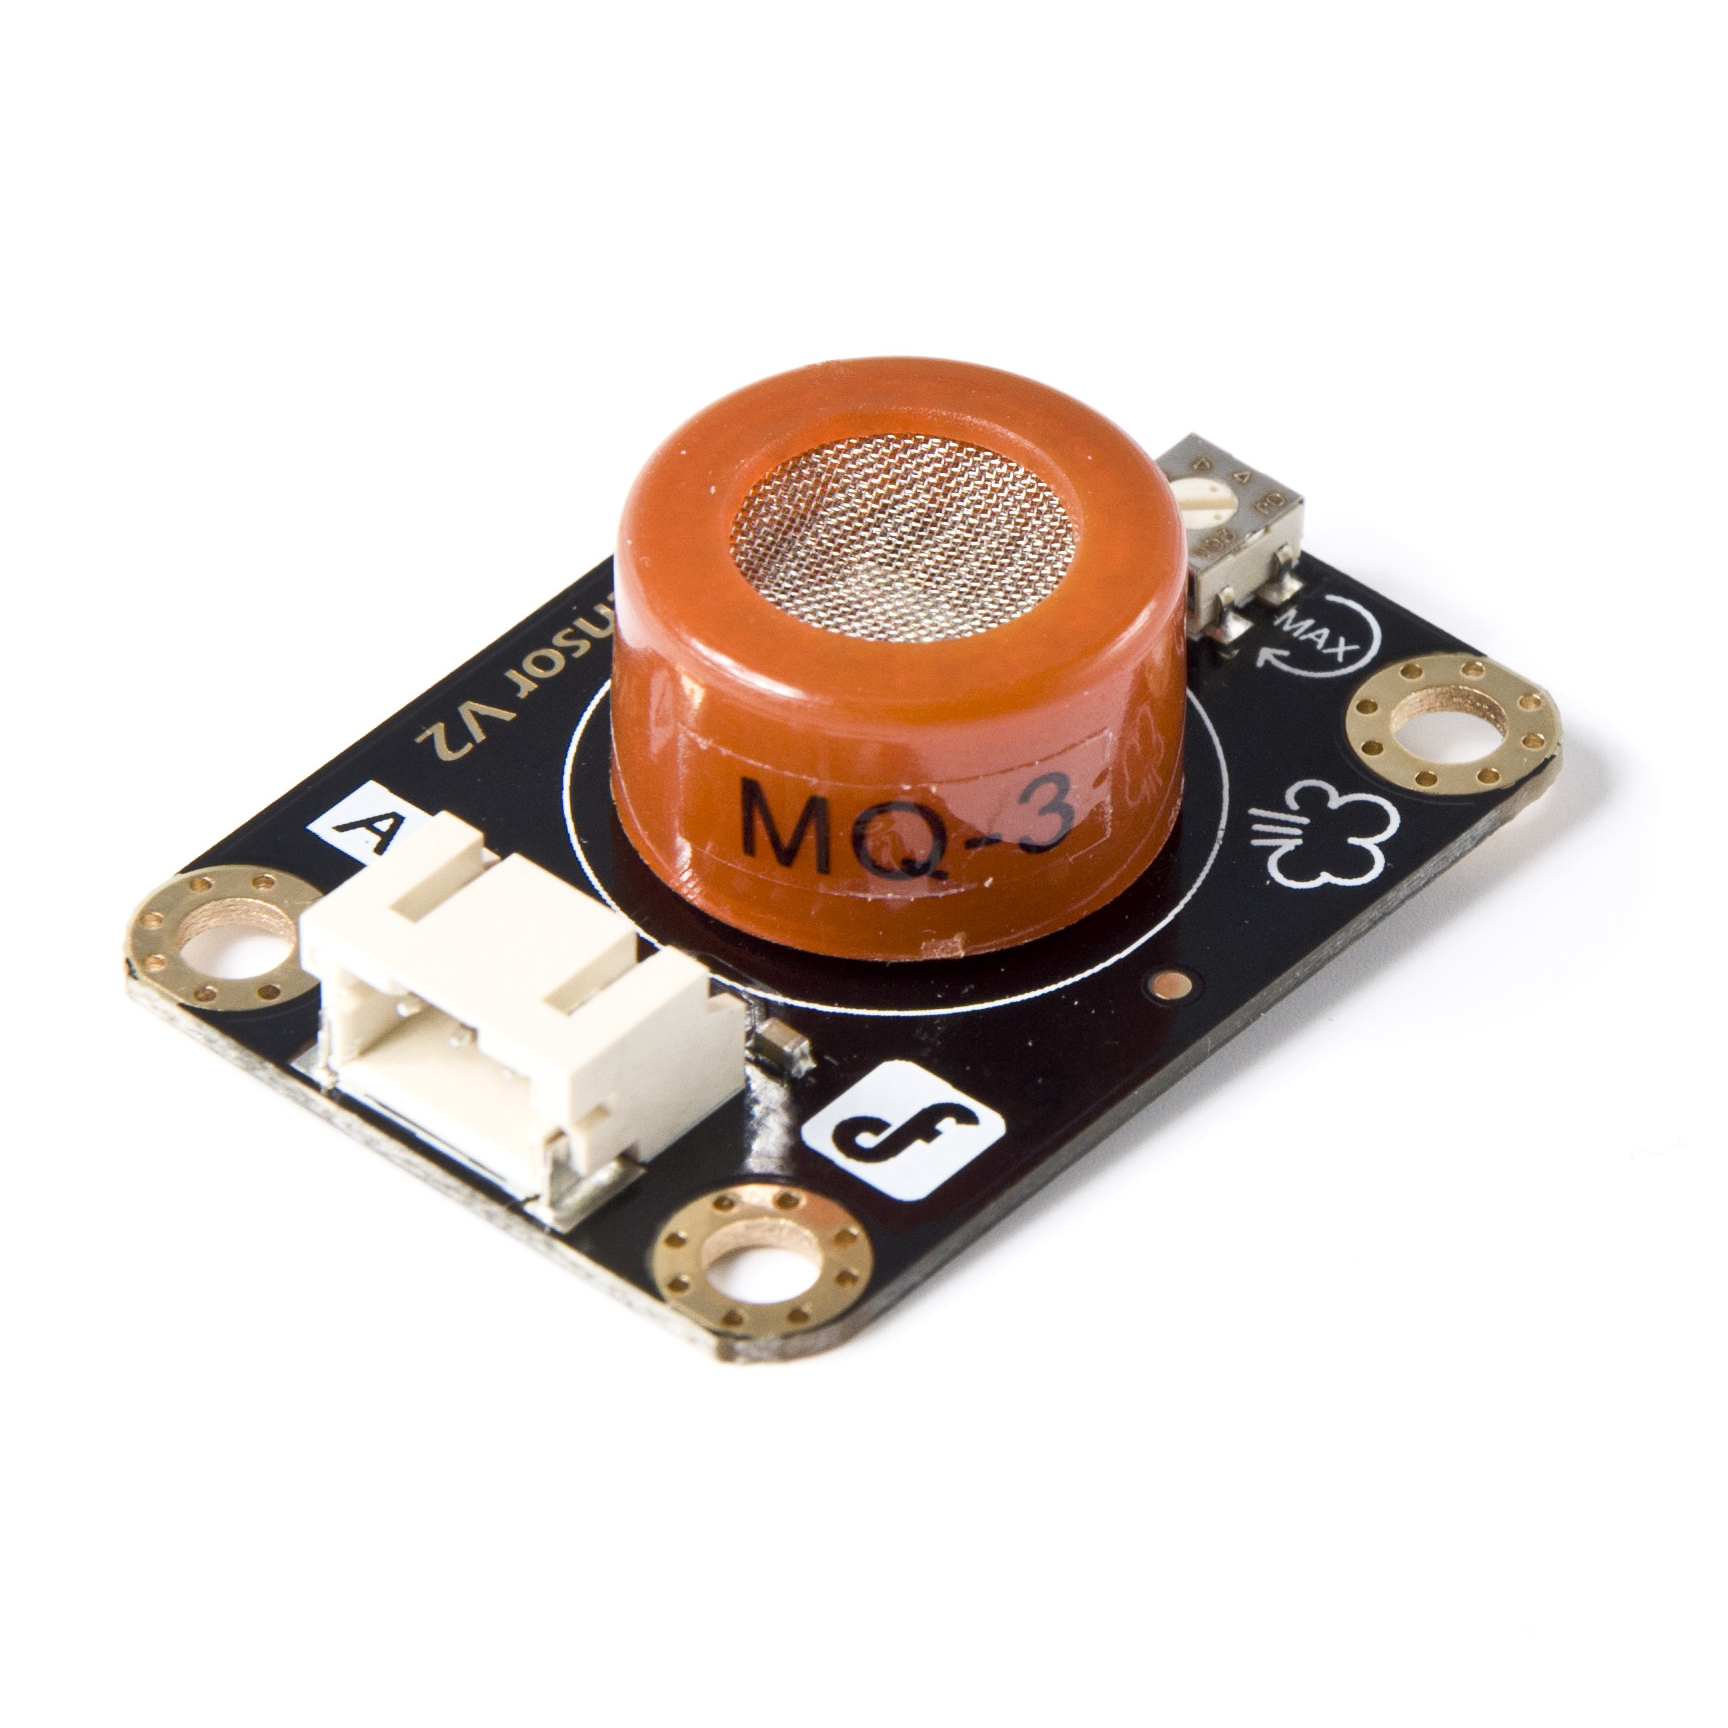 Analog Alcohol Sensor